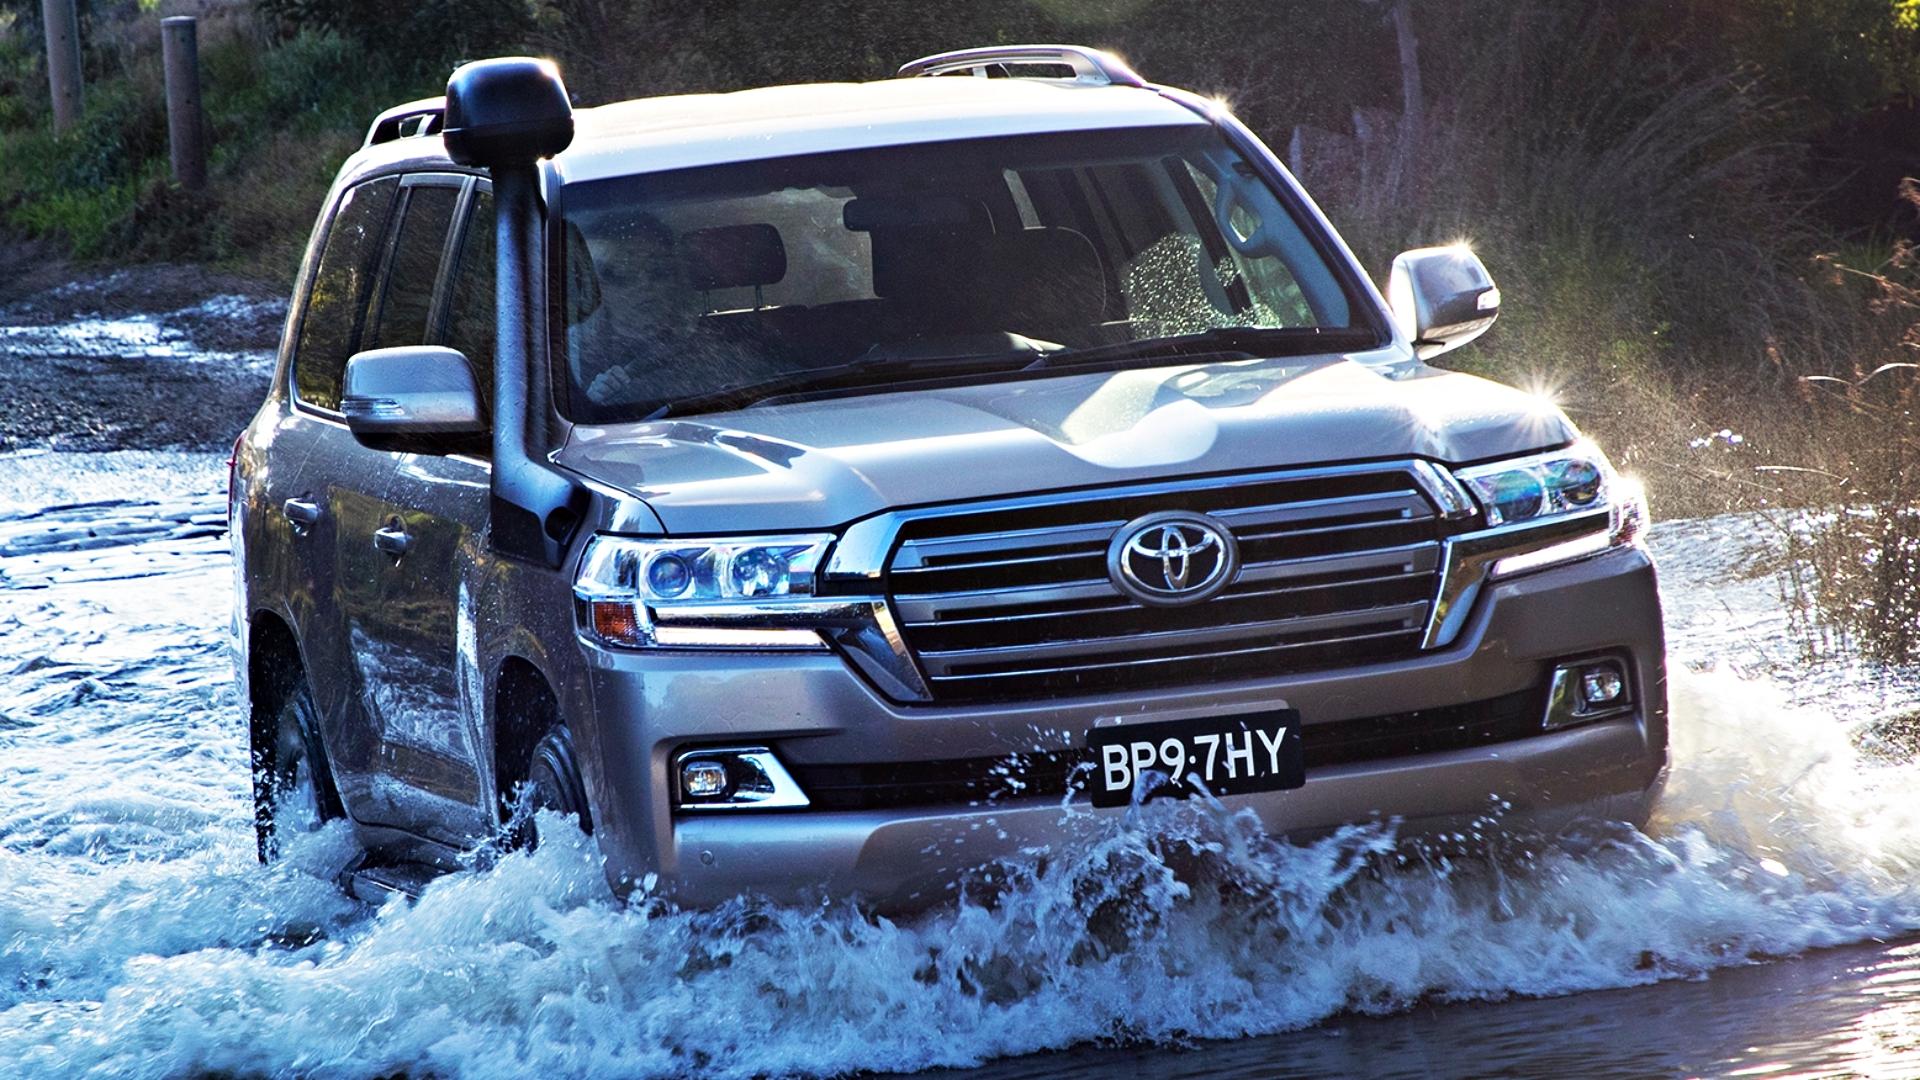 News Toyota Updates Land Cruiser 200 Adds Adas Kit Liberally